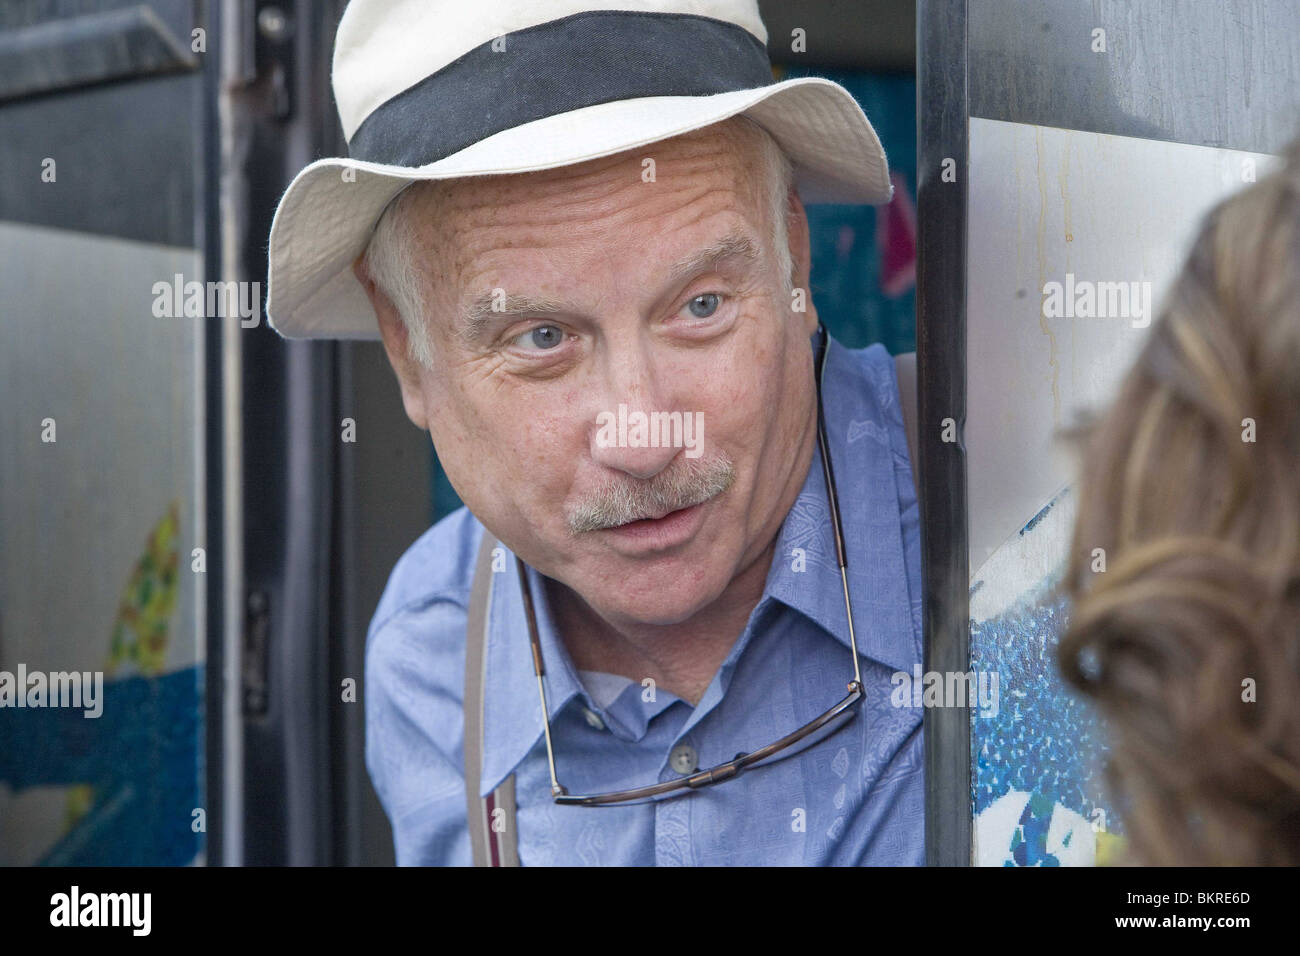 MEIN LEBEN IN RUINEN (2009) RICHARD DREYFUSS DONALD PETRIE (DIR) 001 Stockbild